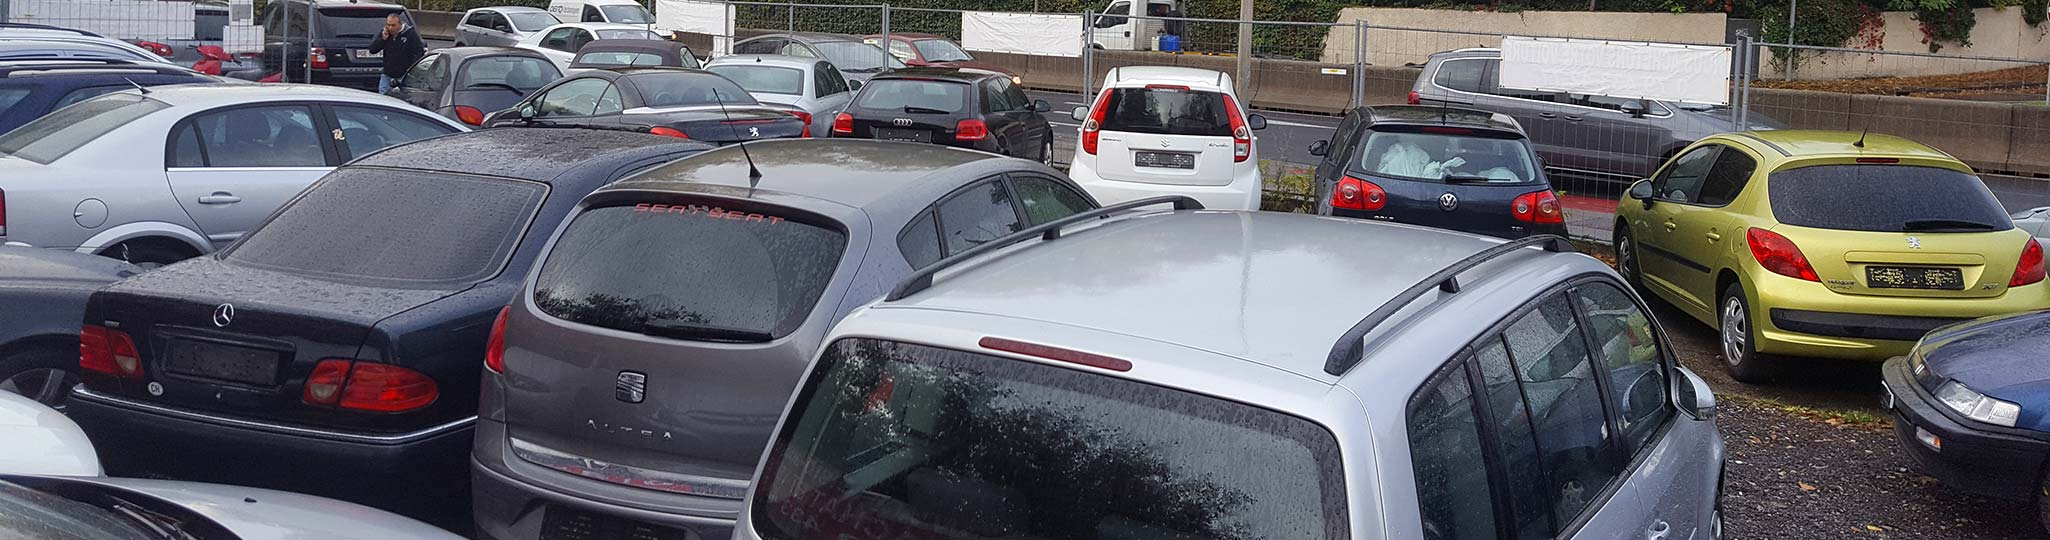 Autos occasion geneve elsib autos achat et vente for Garage vente voiture occasion montargis